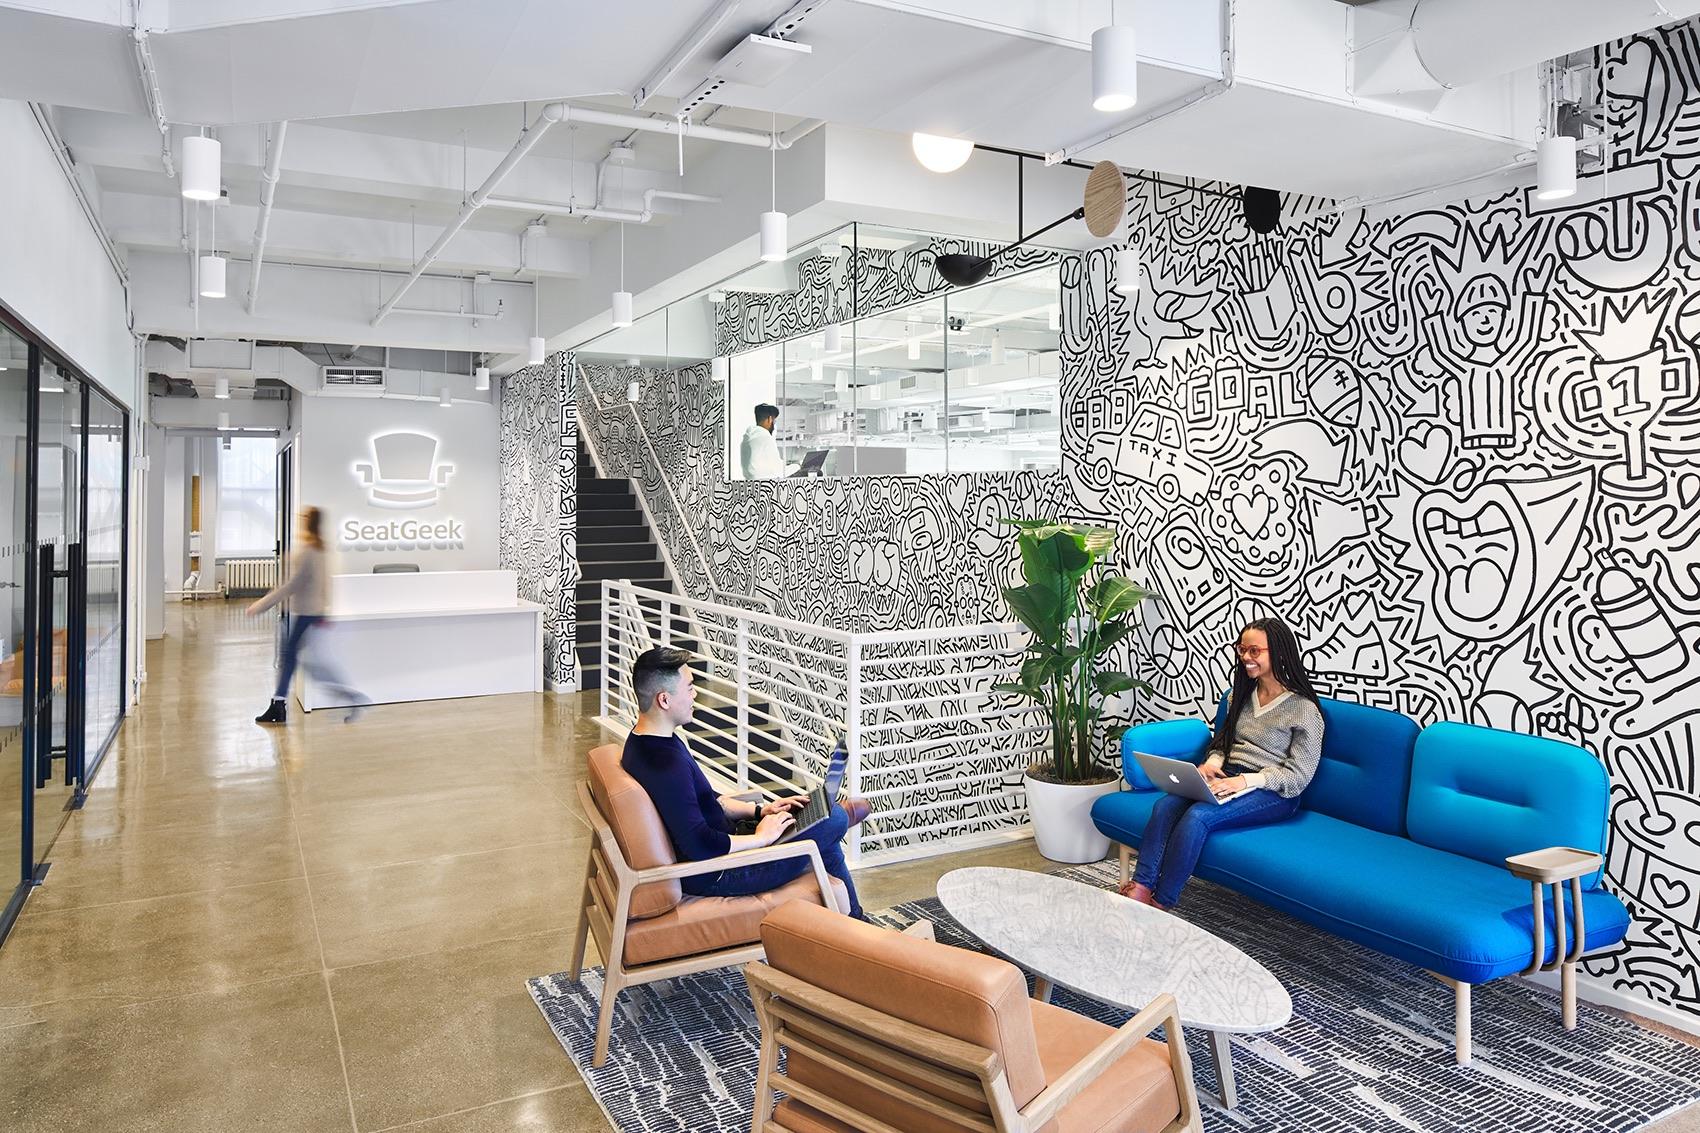 seatgeek-nyc-office-1